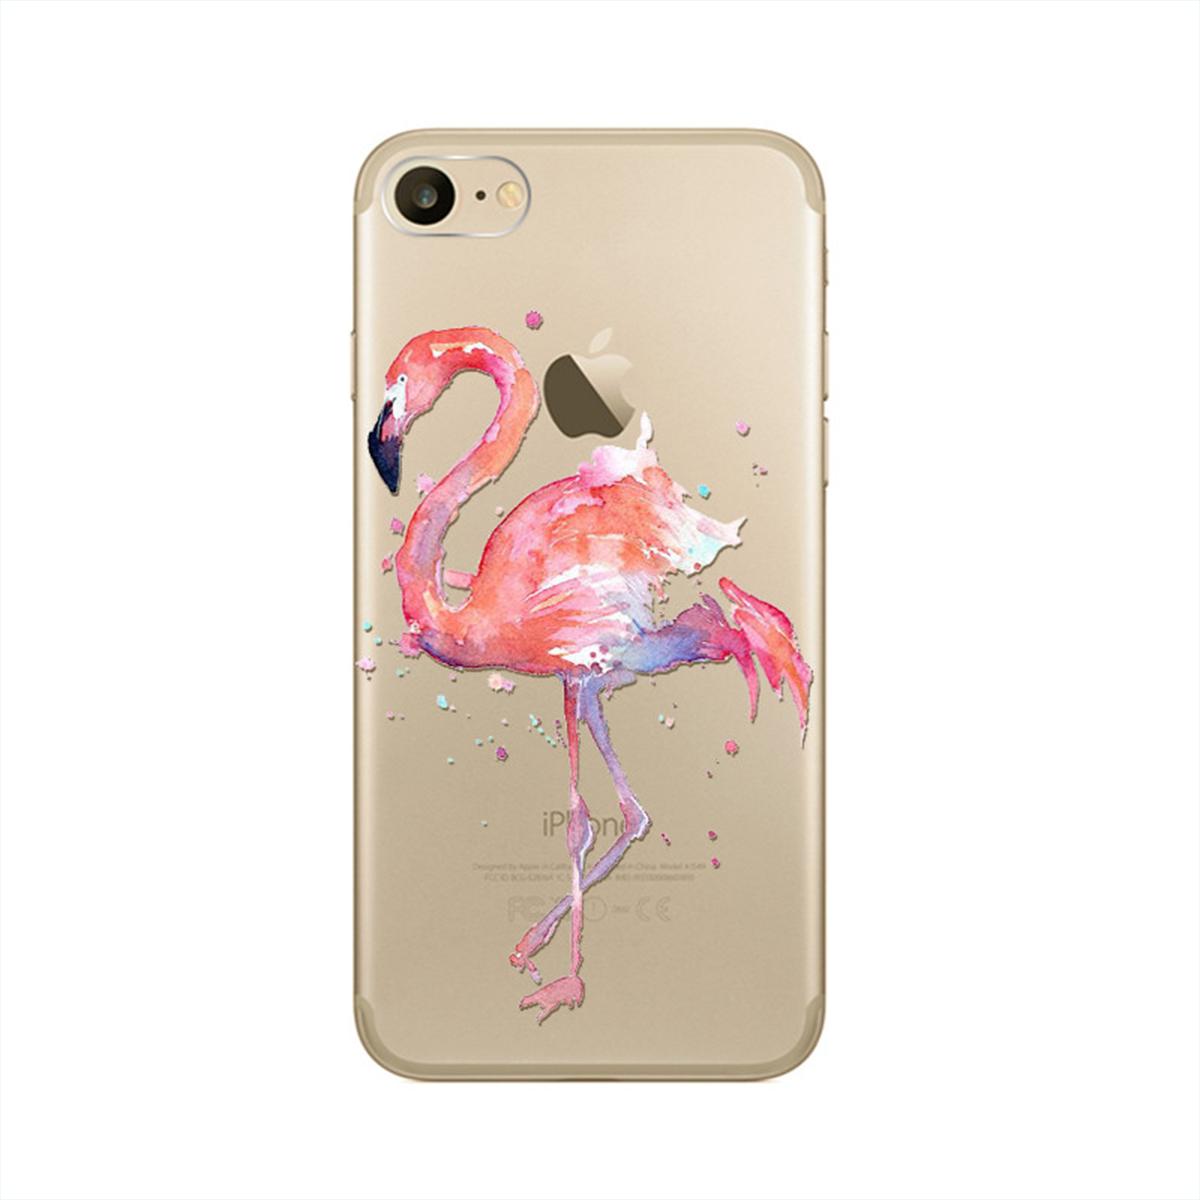 Kritzel Schutzhülle für iPhone 7 - Flamingo